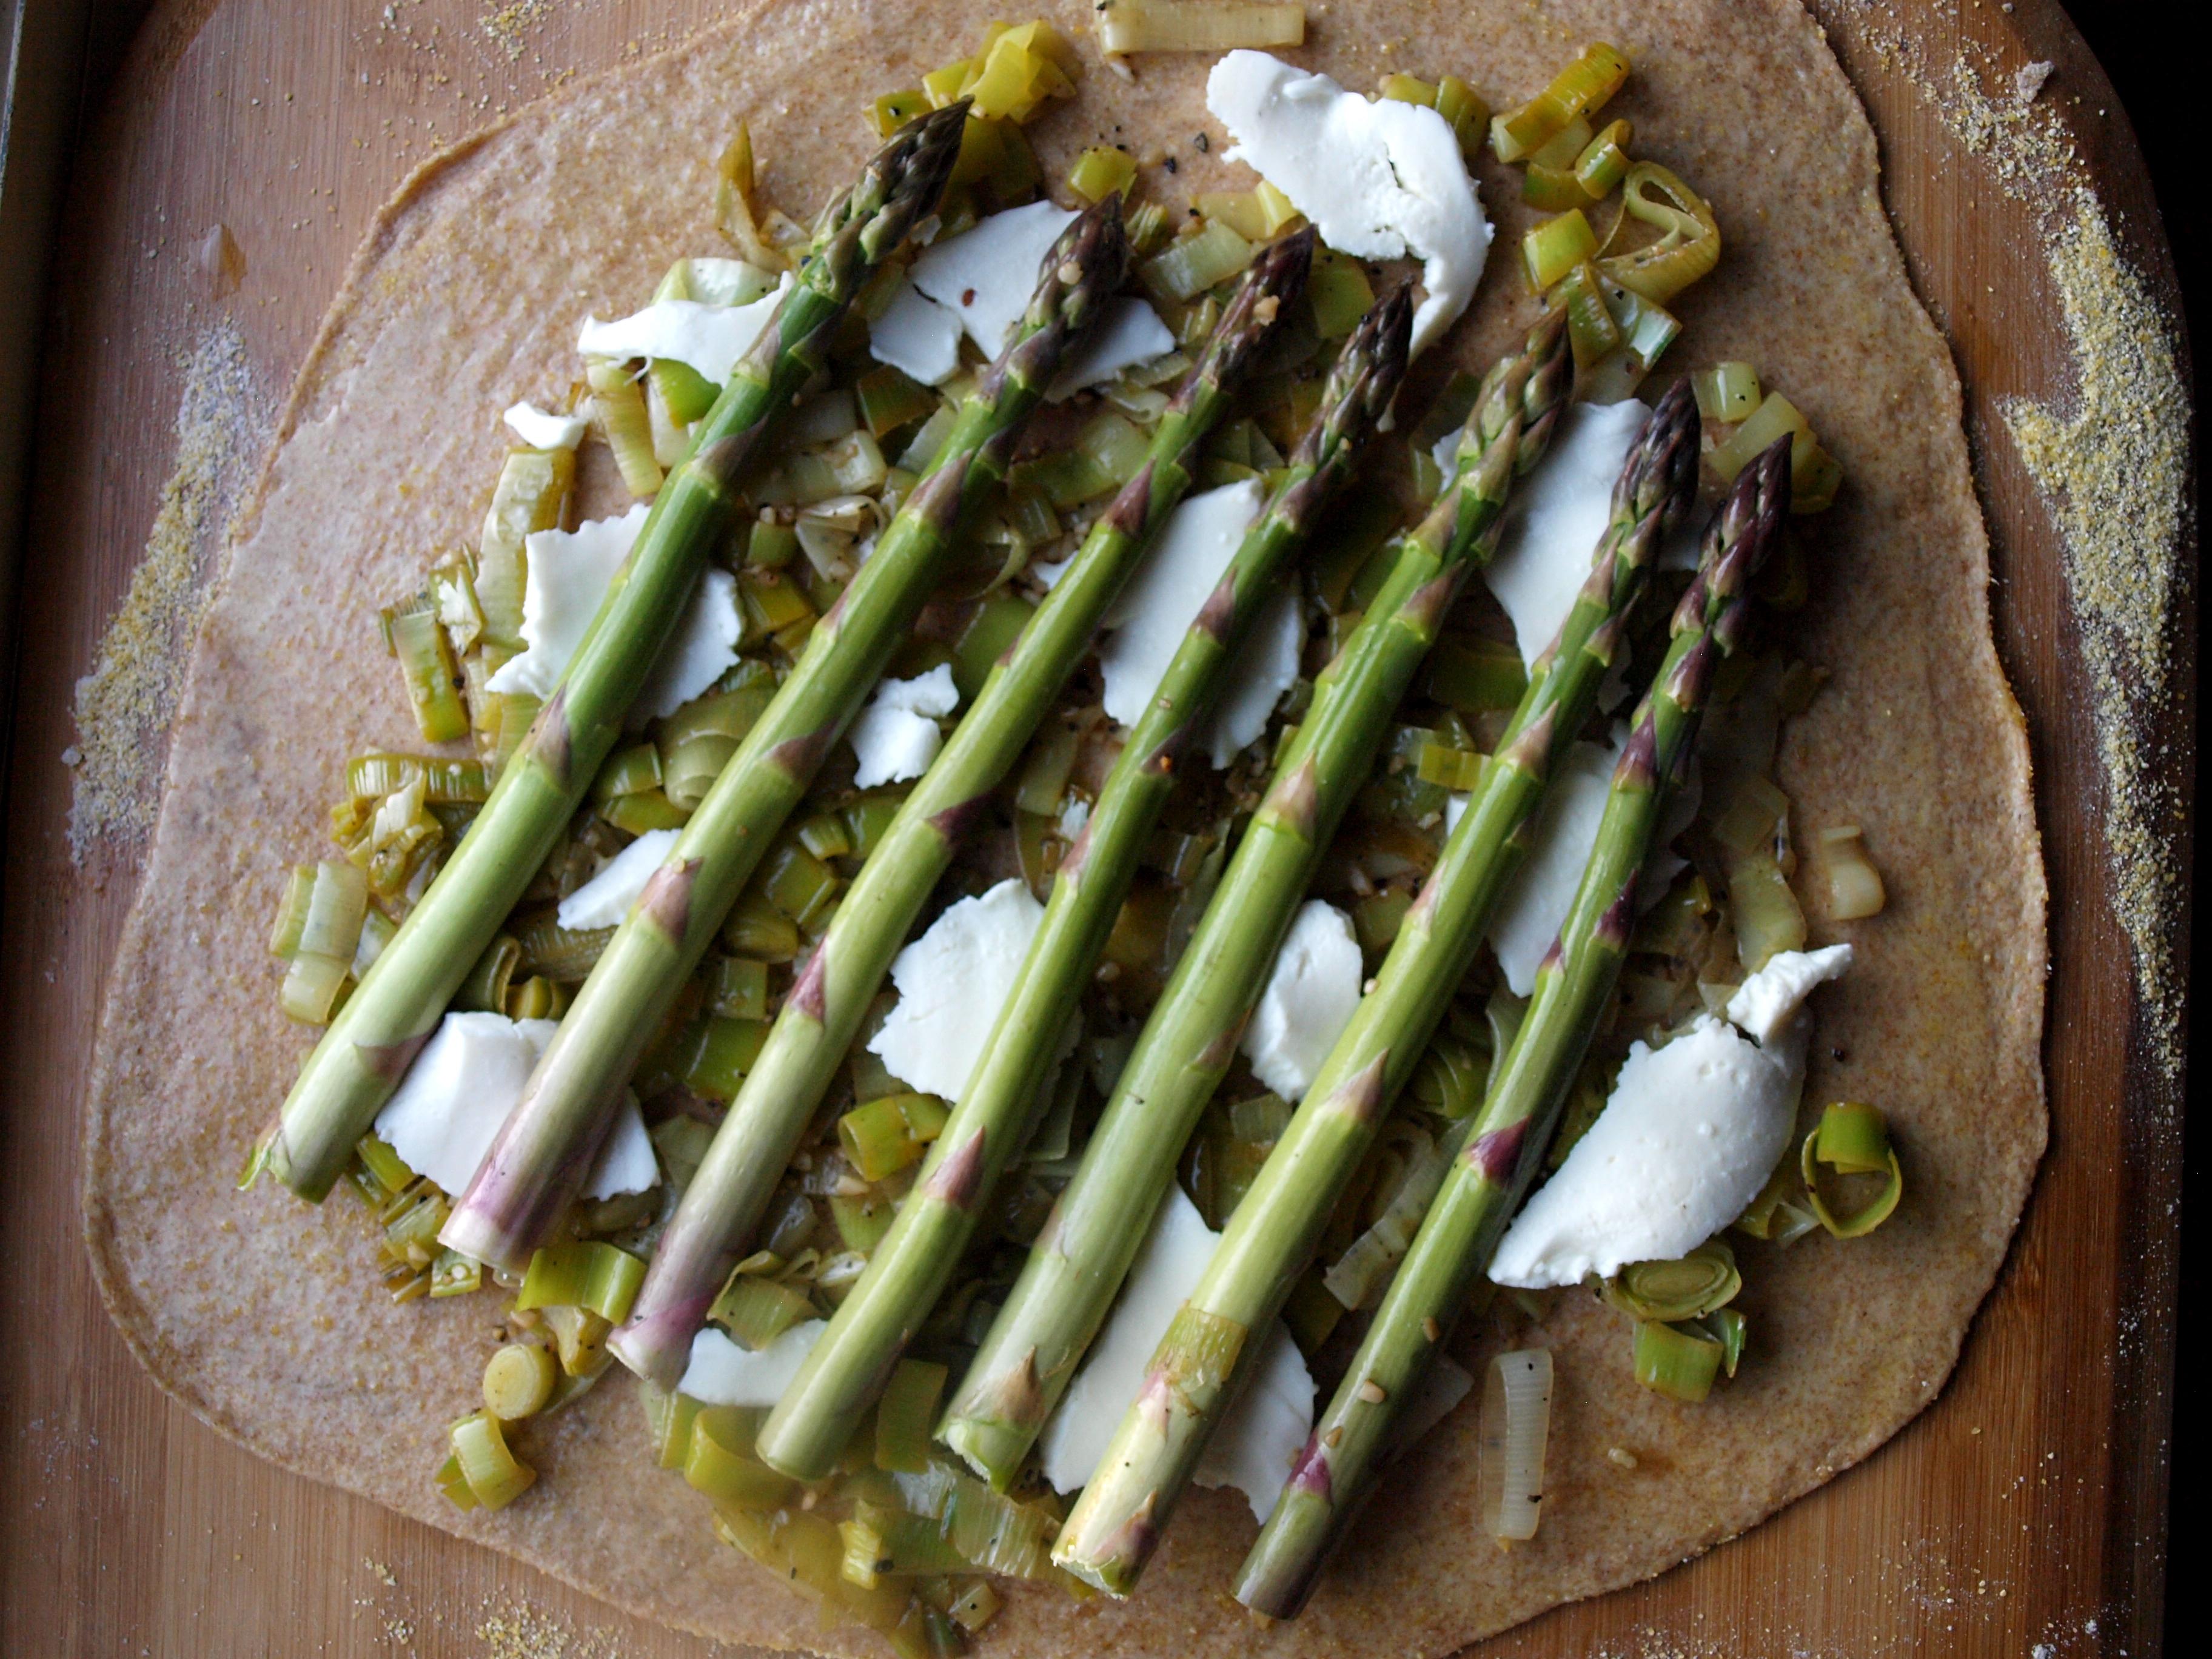 Crispy Asparagus Flatbread, prepared